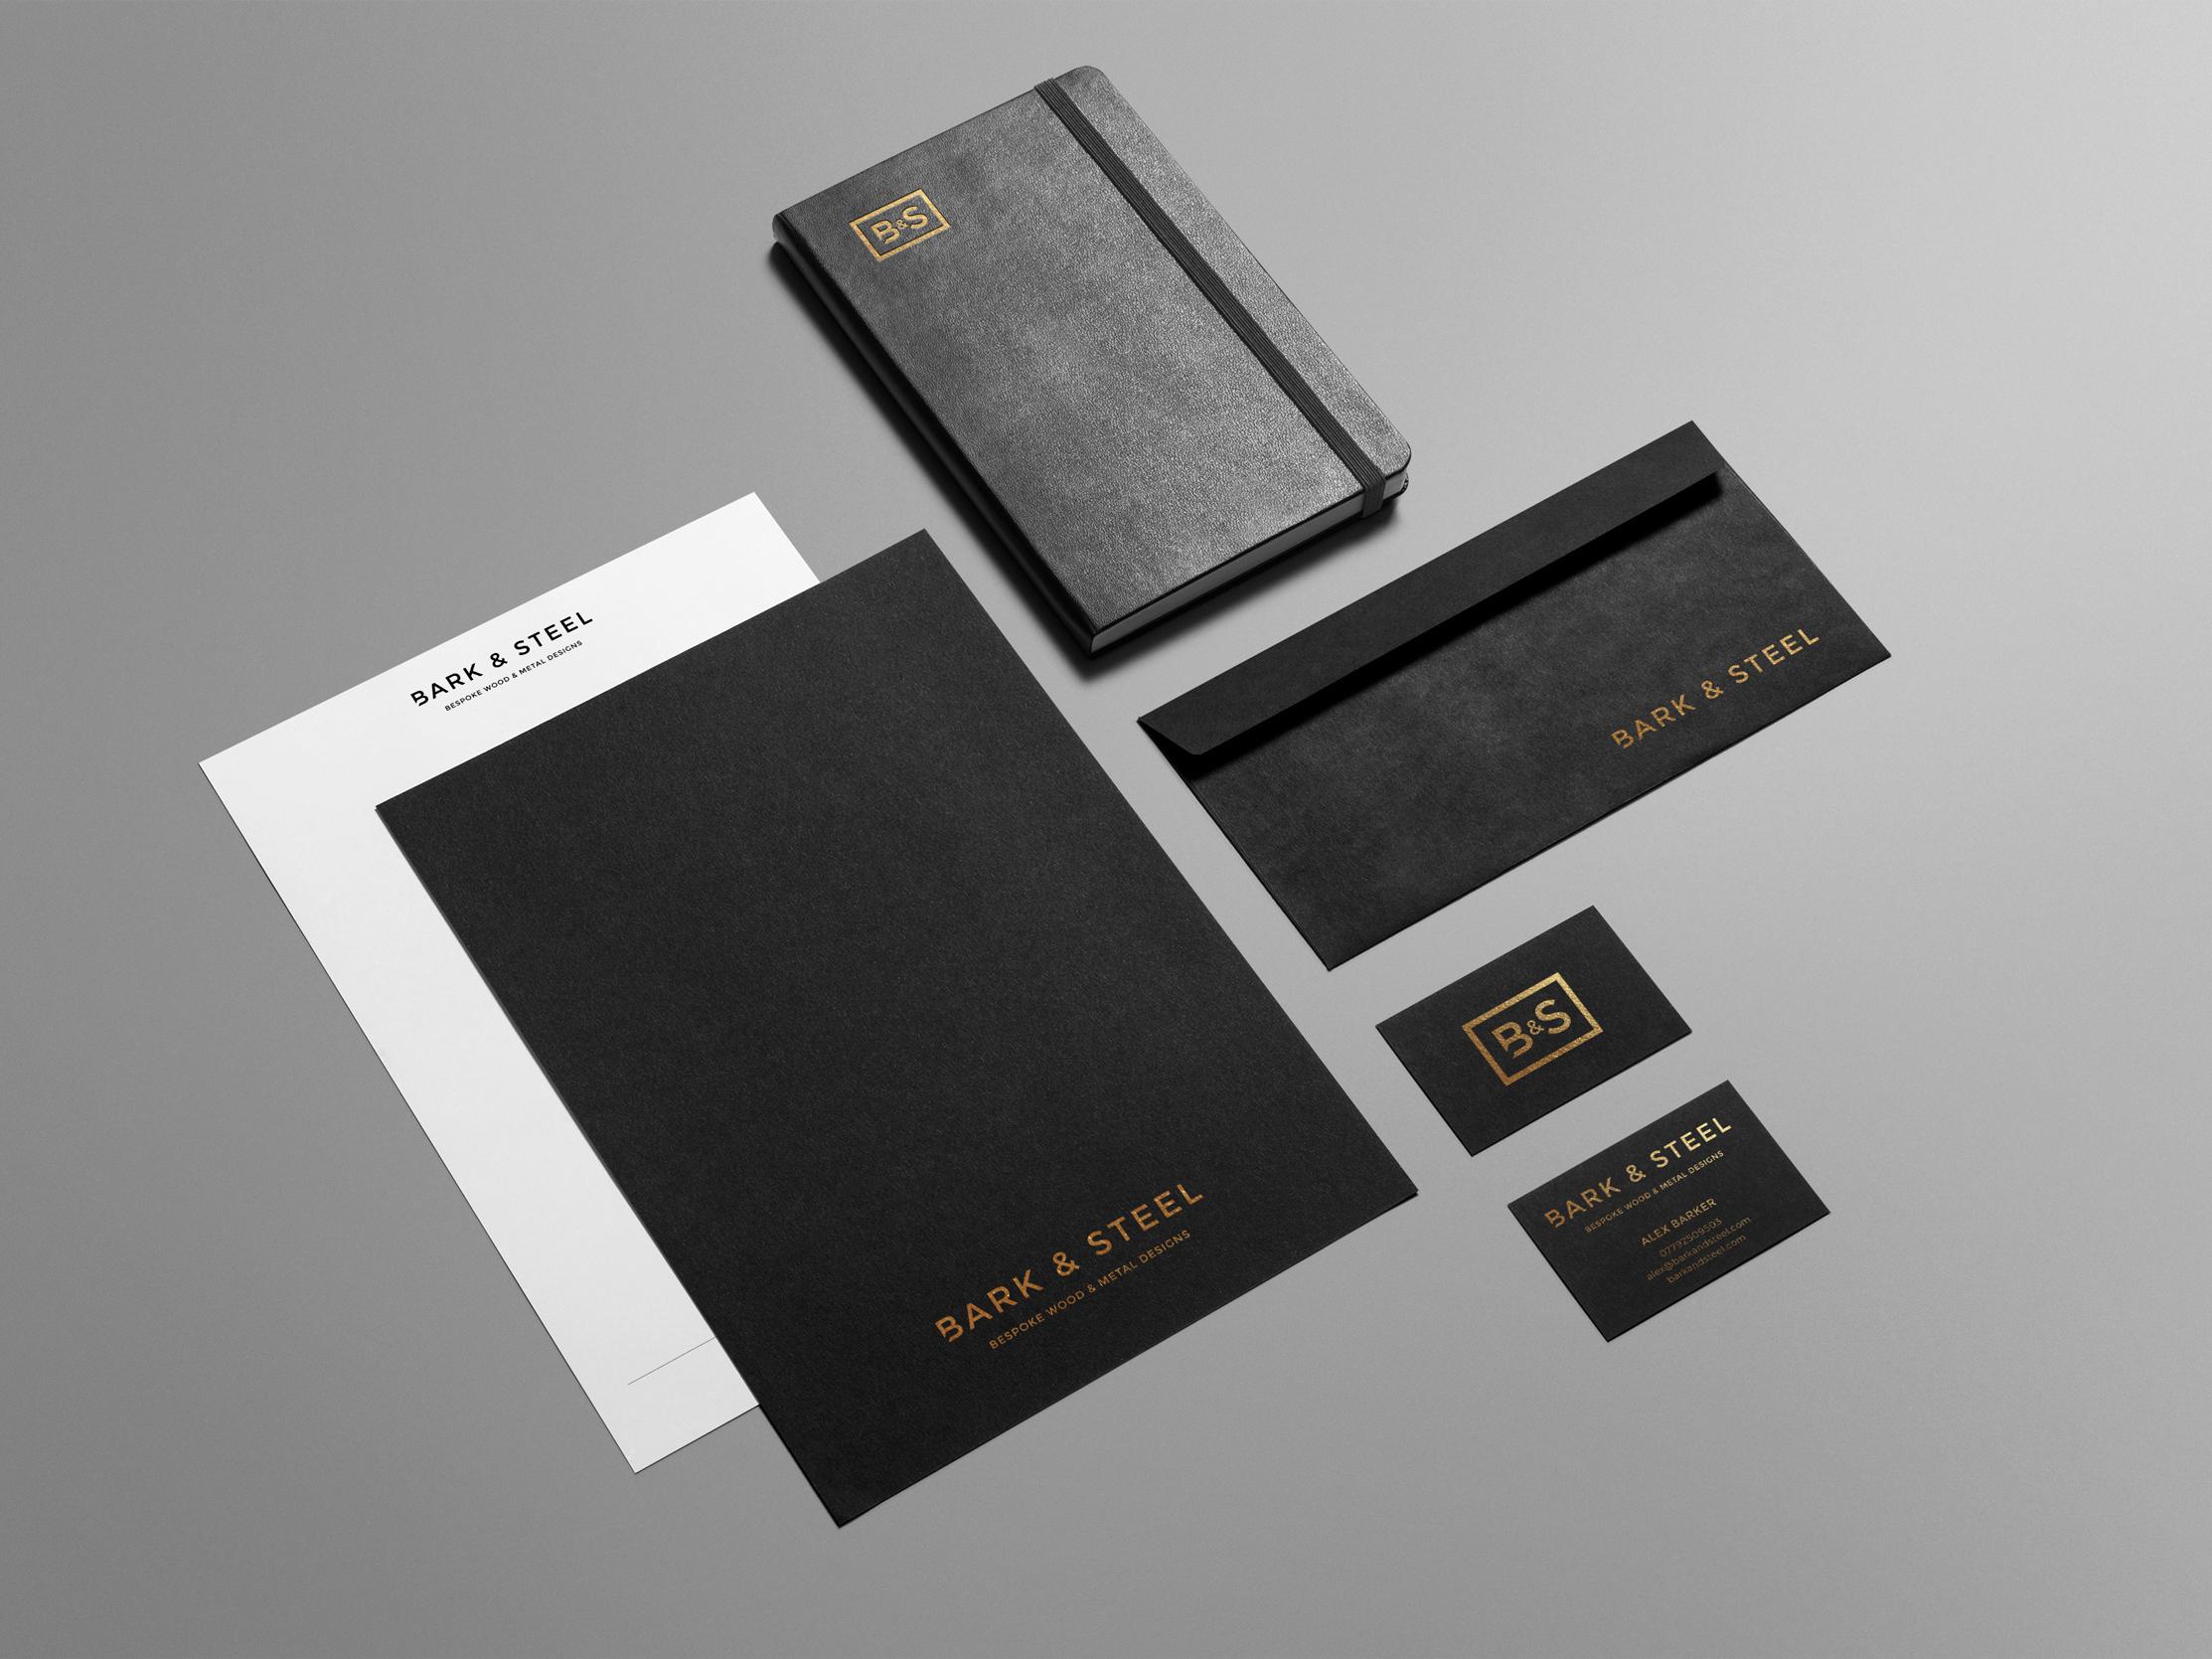 Bark & Steel   Bespoke Wood & metal Designs   Branding   Brand   Logo Design   Stationery